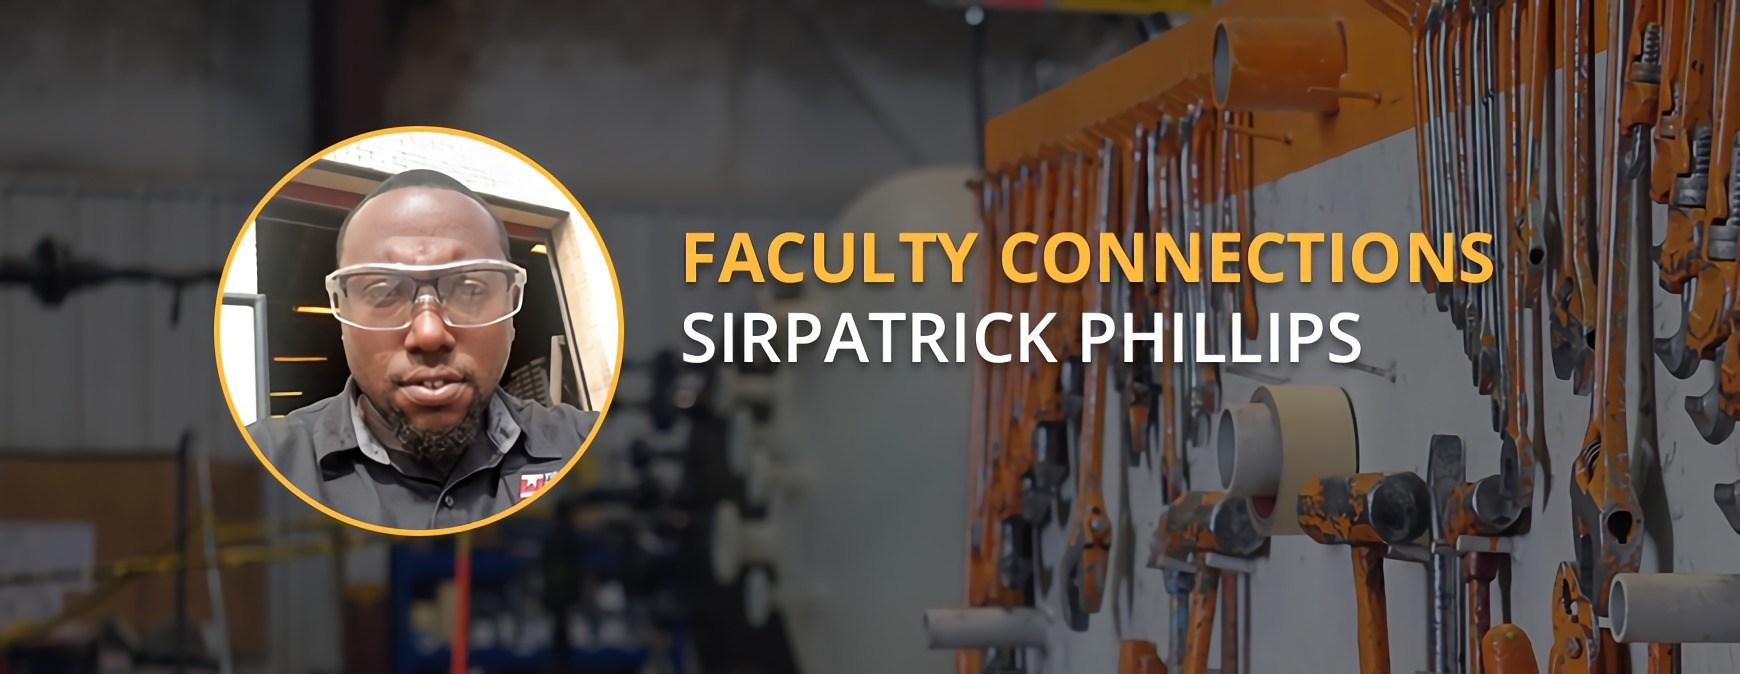 SirPatrick Phillips